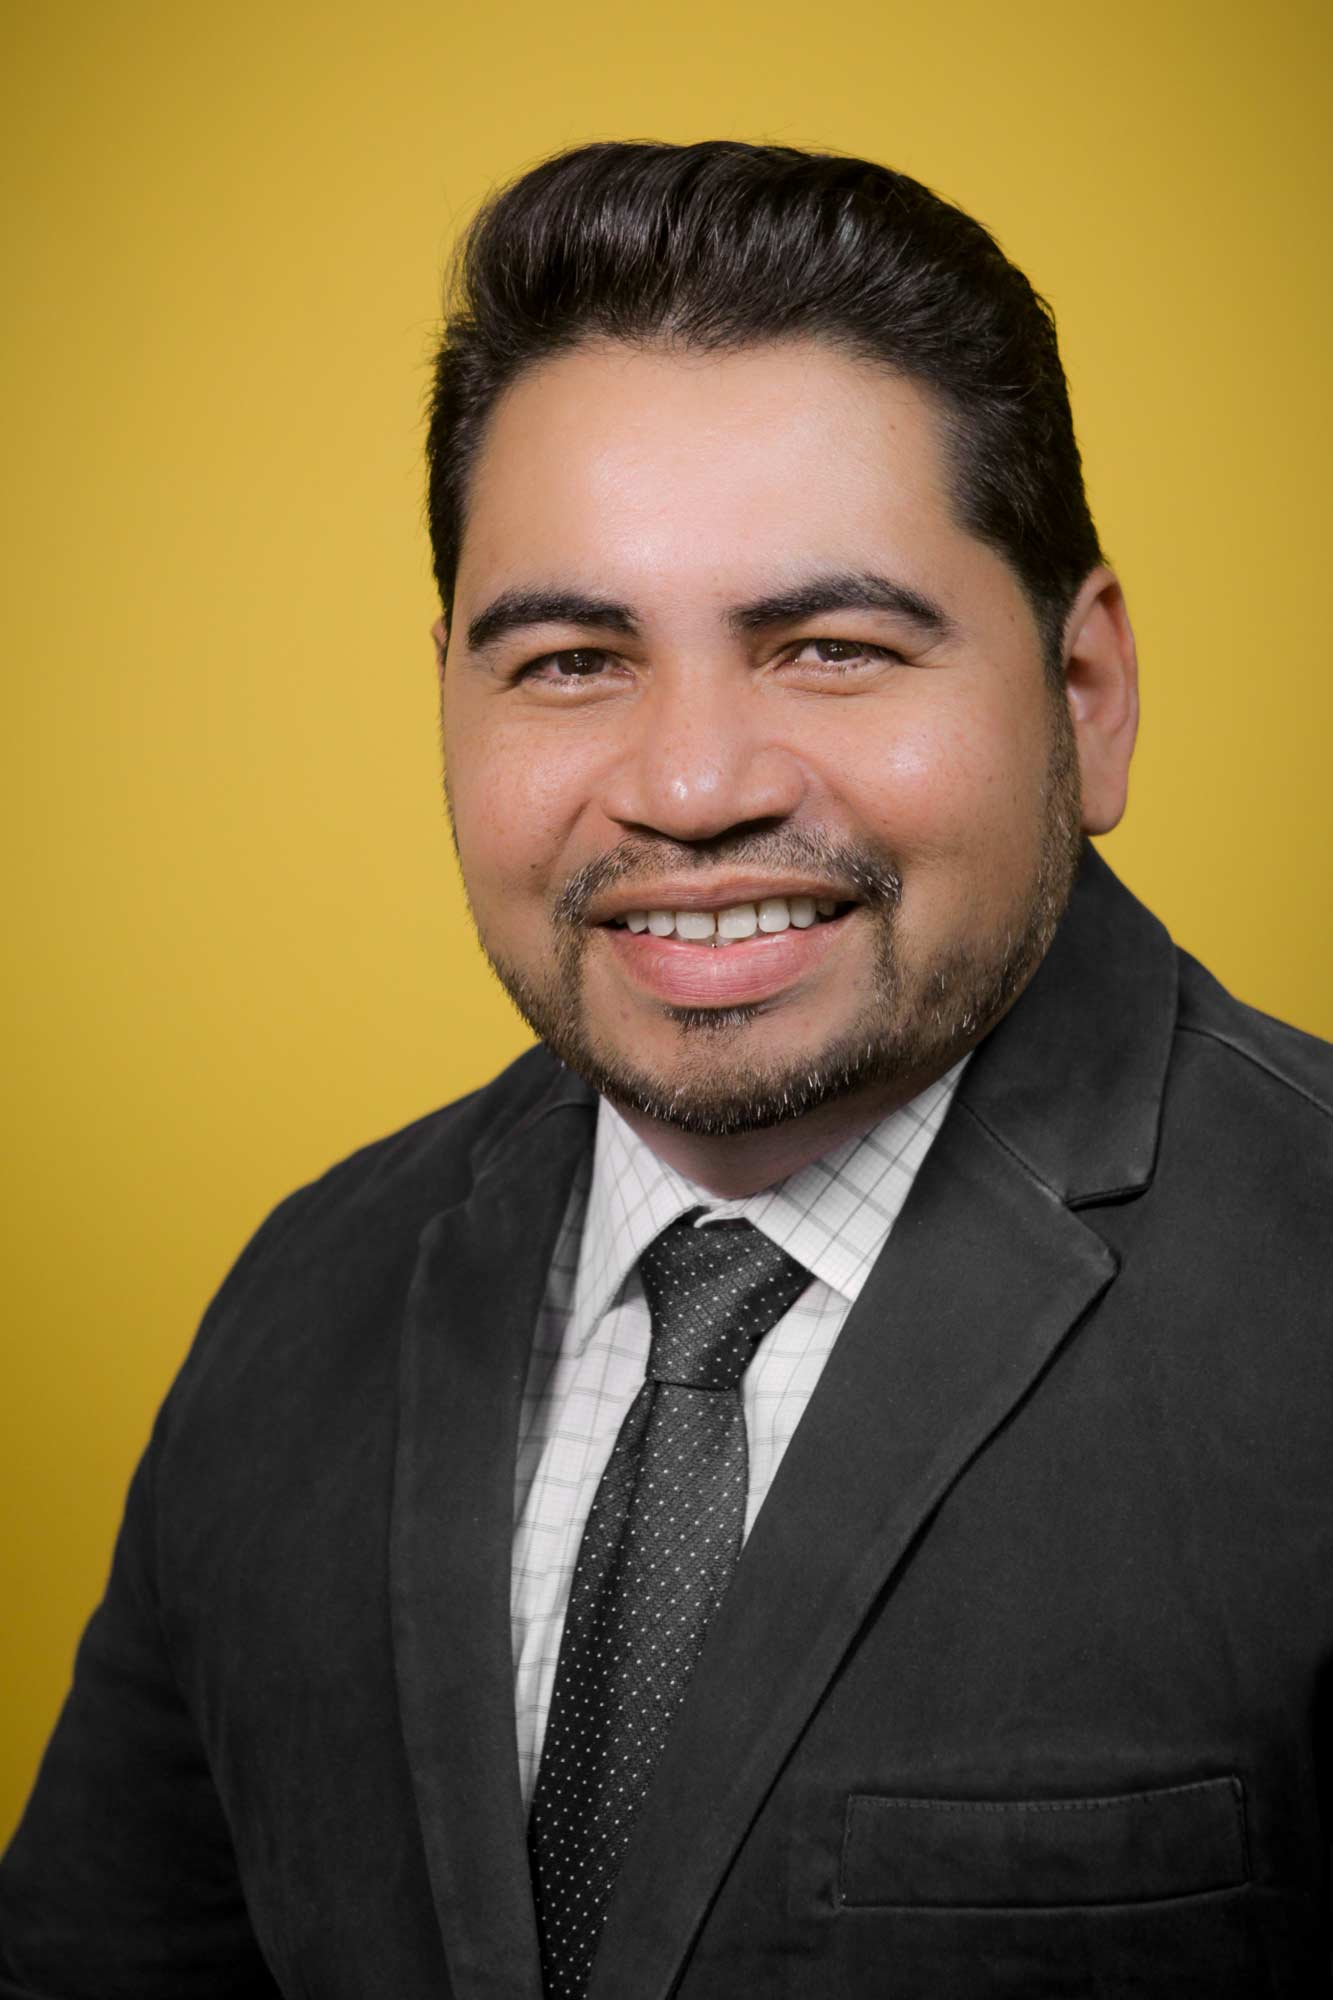 Wilmer Maradiaga